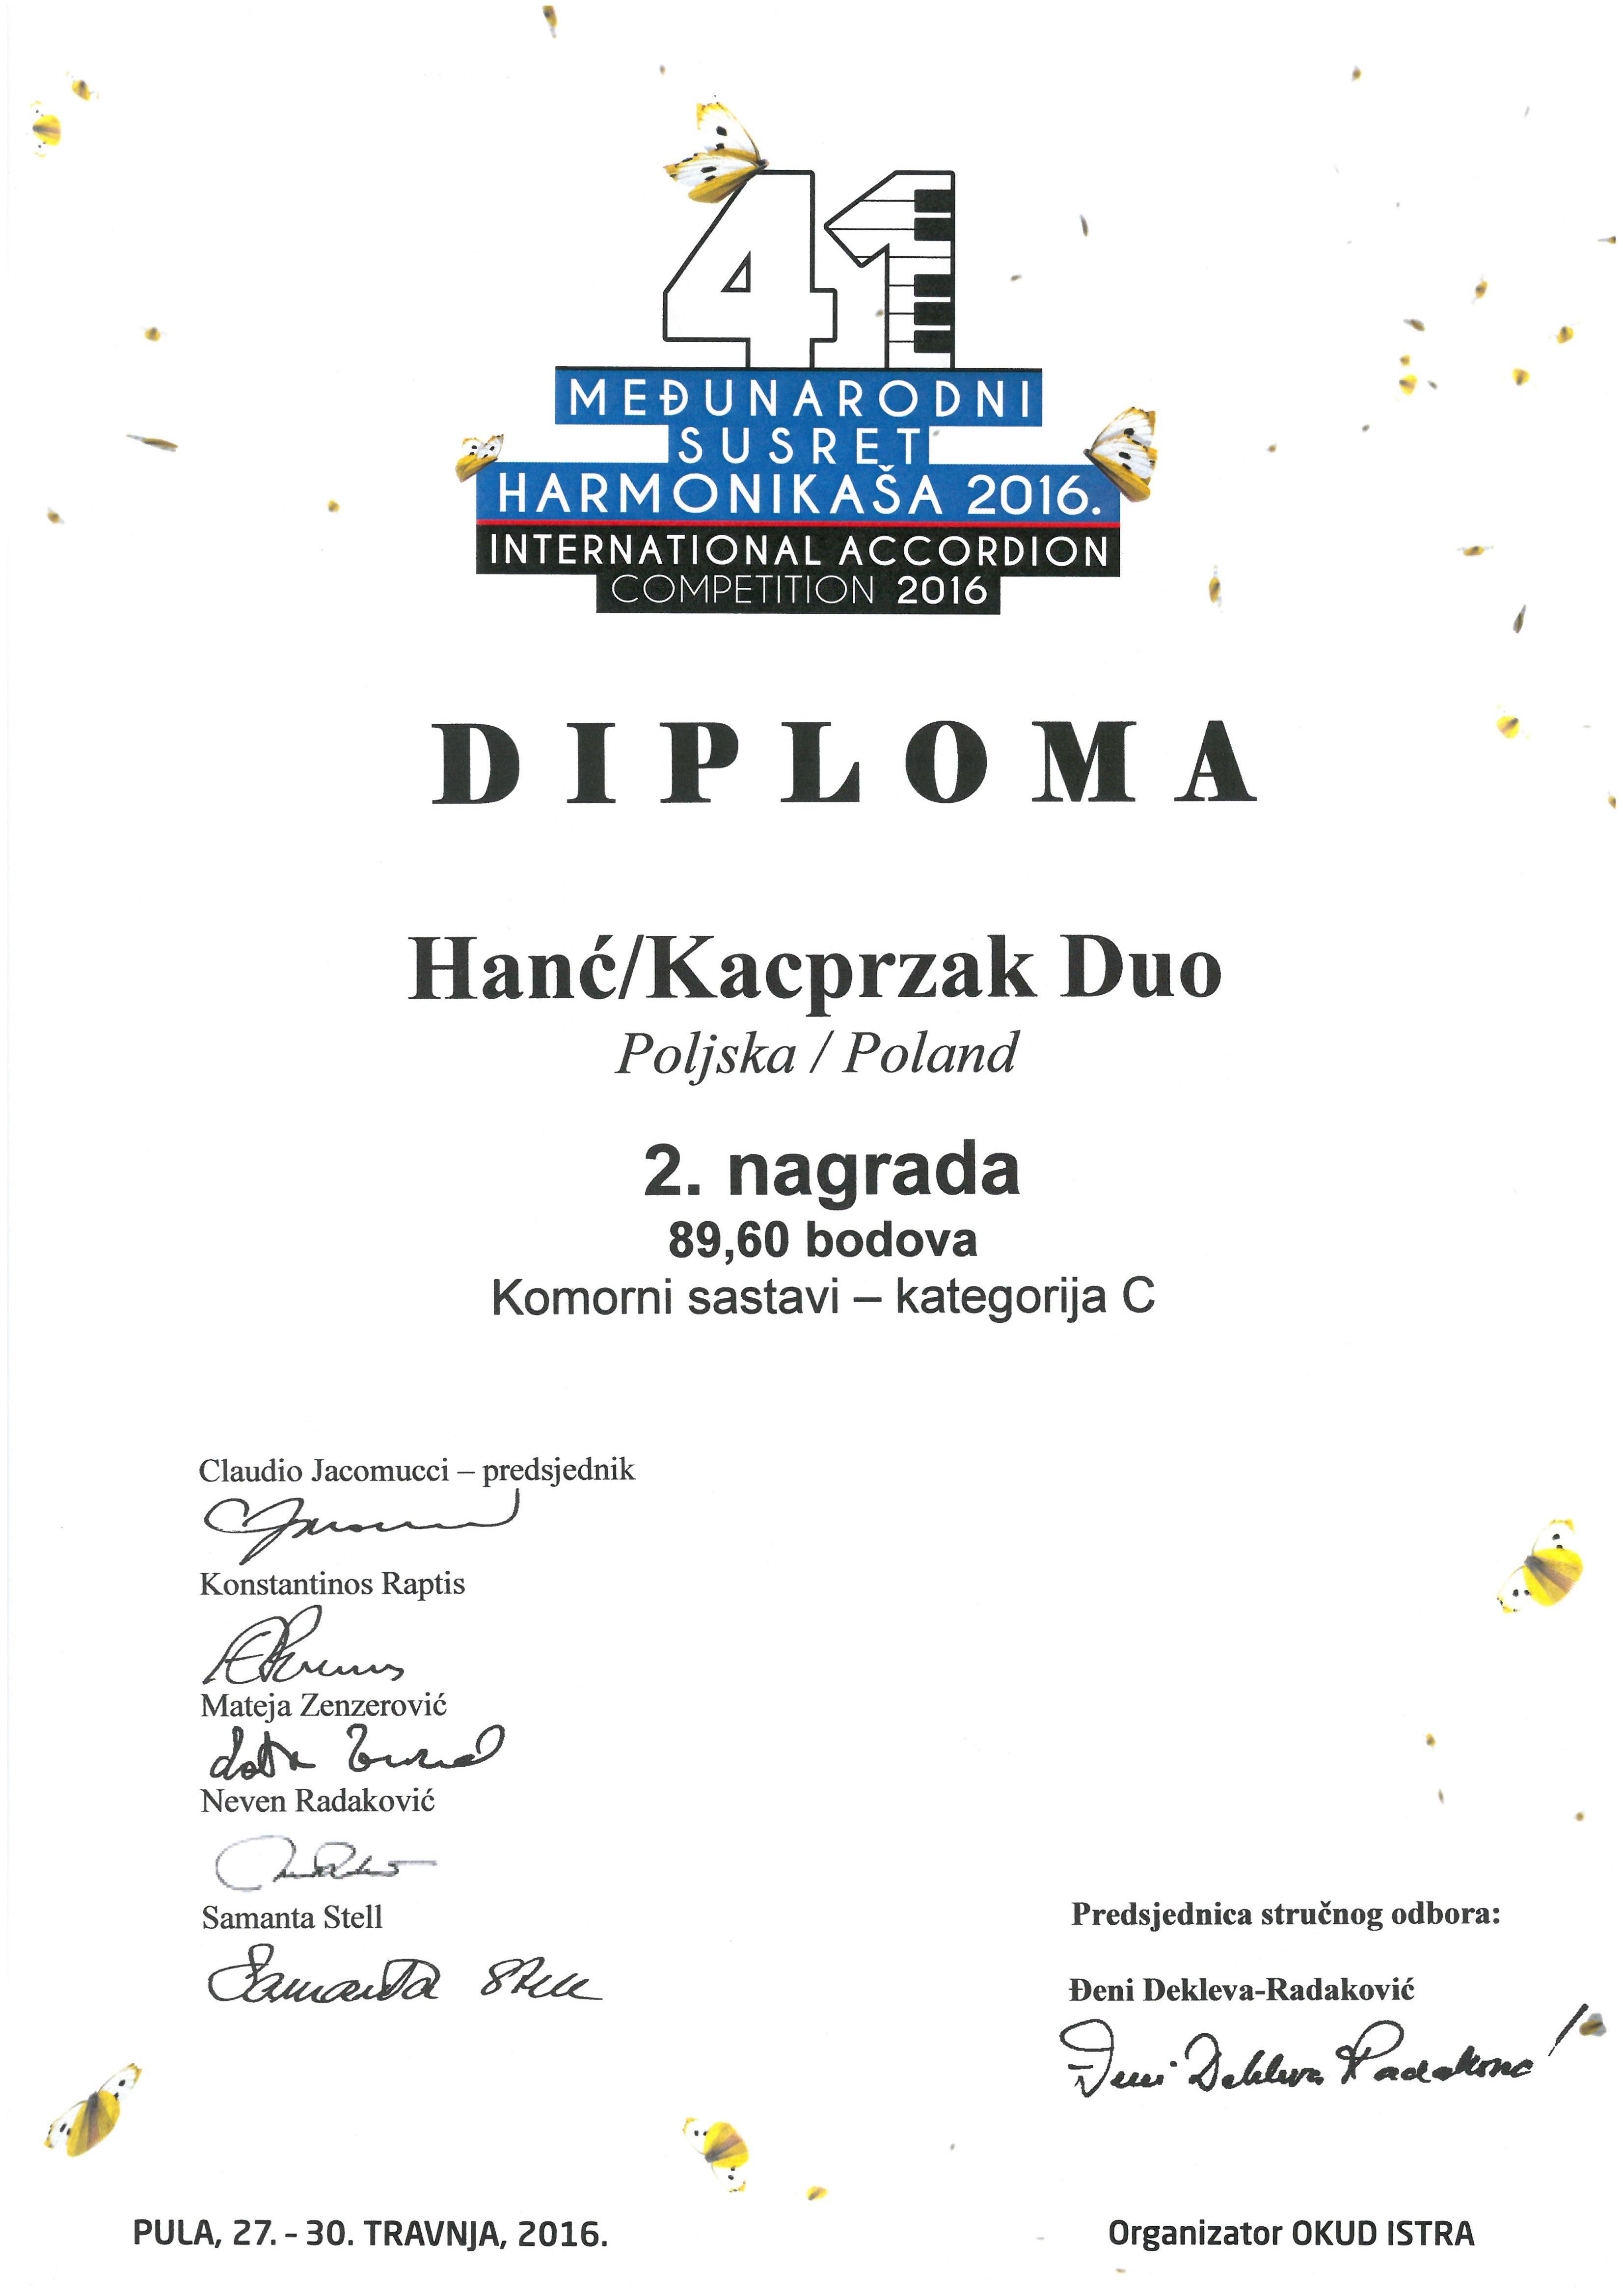 Hanc-Kacprzak_Pula_2016